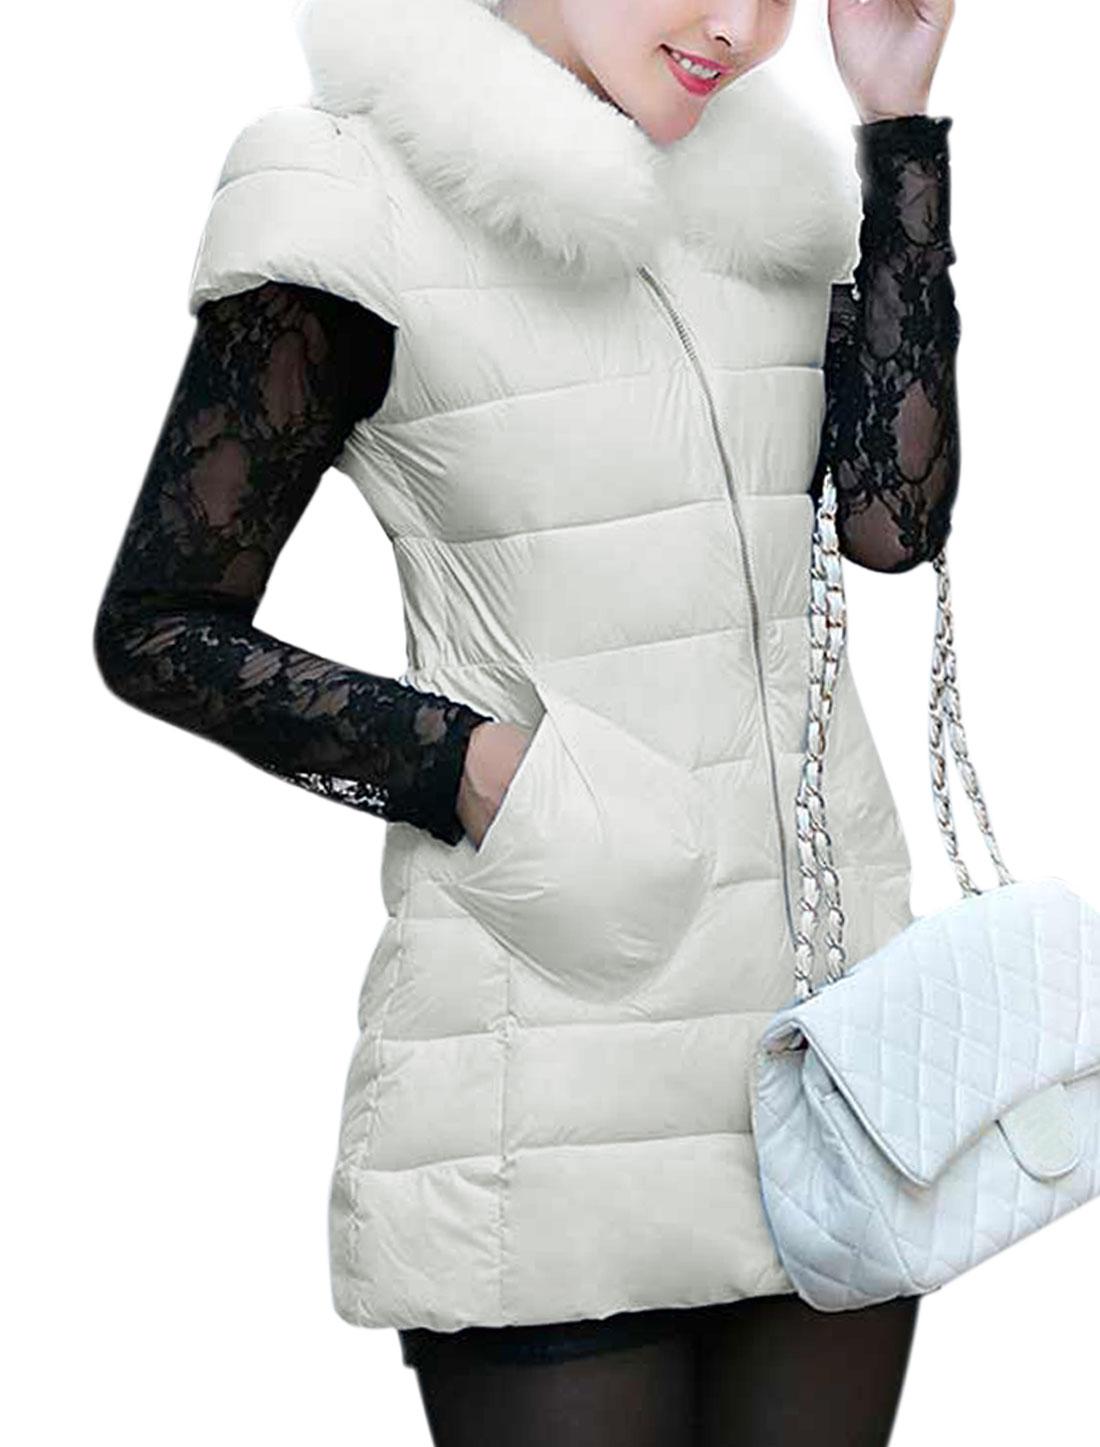 Ladies Round Neckline Zip-Up Front Cap Sleeves Padded Vest White XS